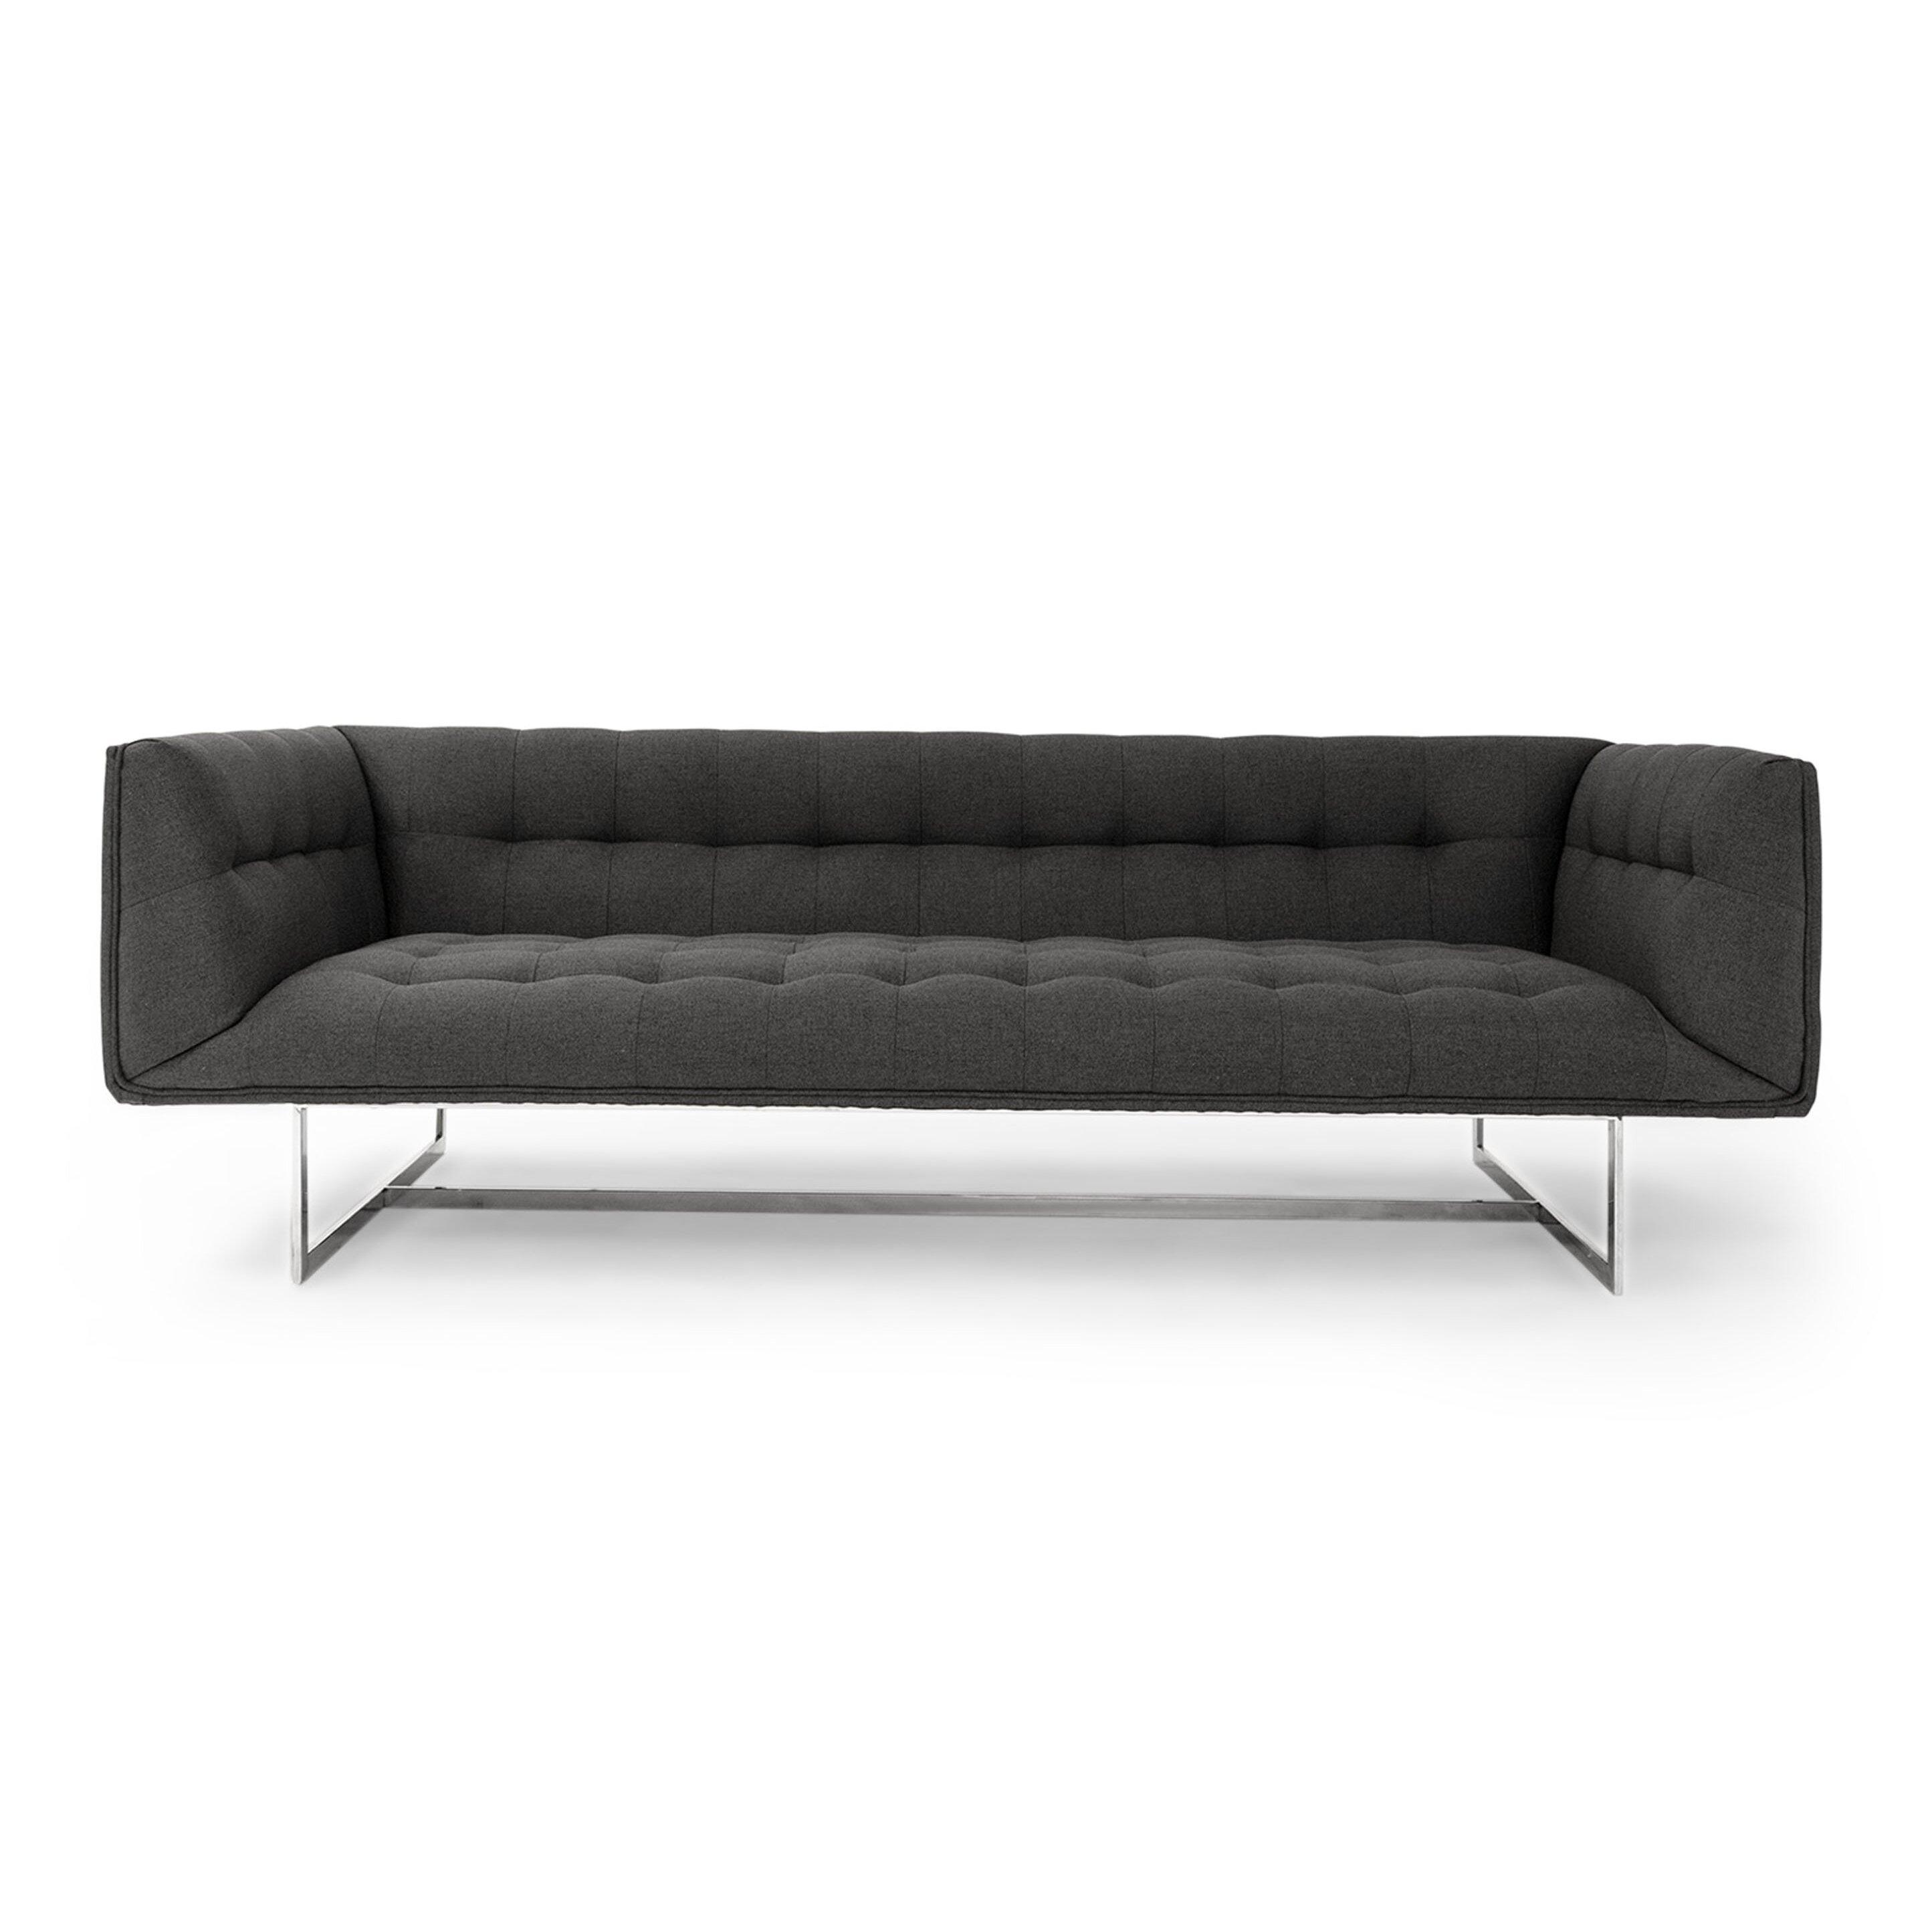 Kardiel edward mid century modern sofa amp reviews wayfair